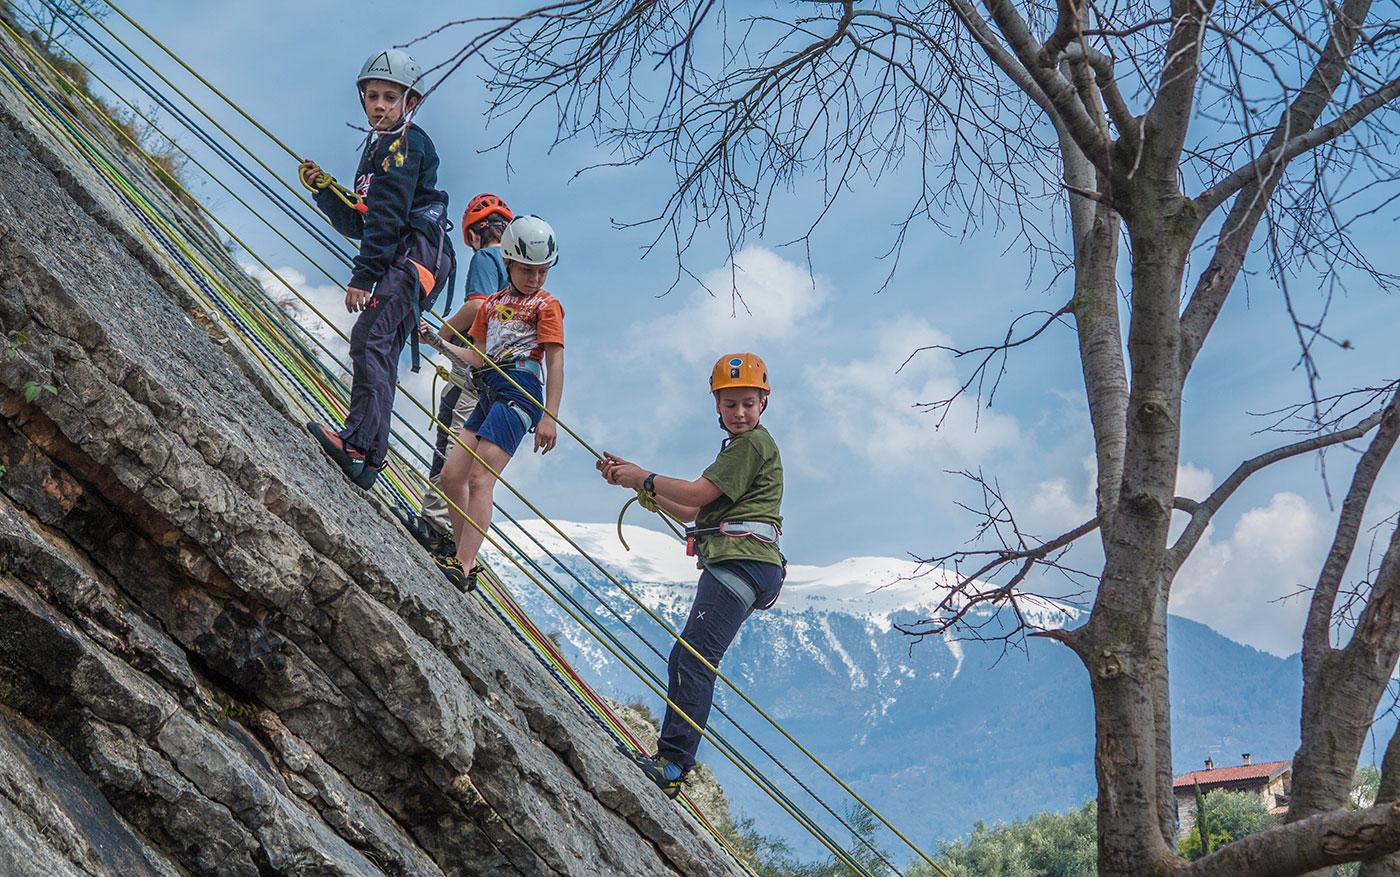 corso arrampicata per bambini al lago di garda